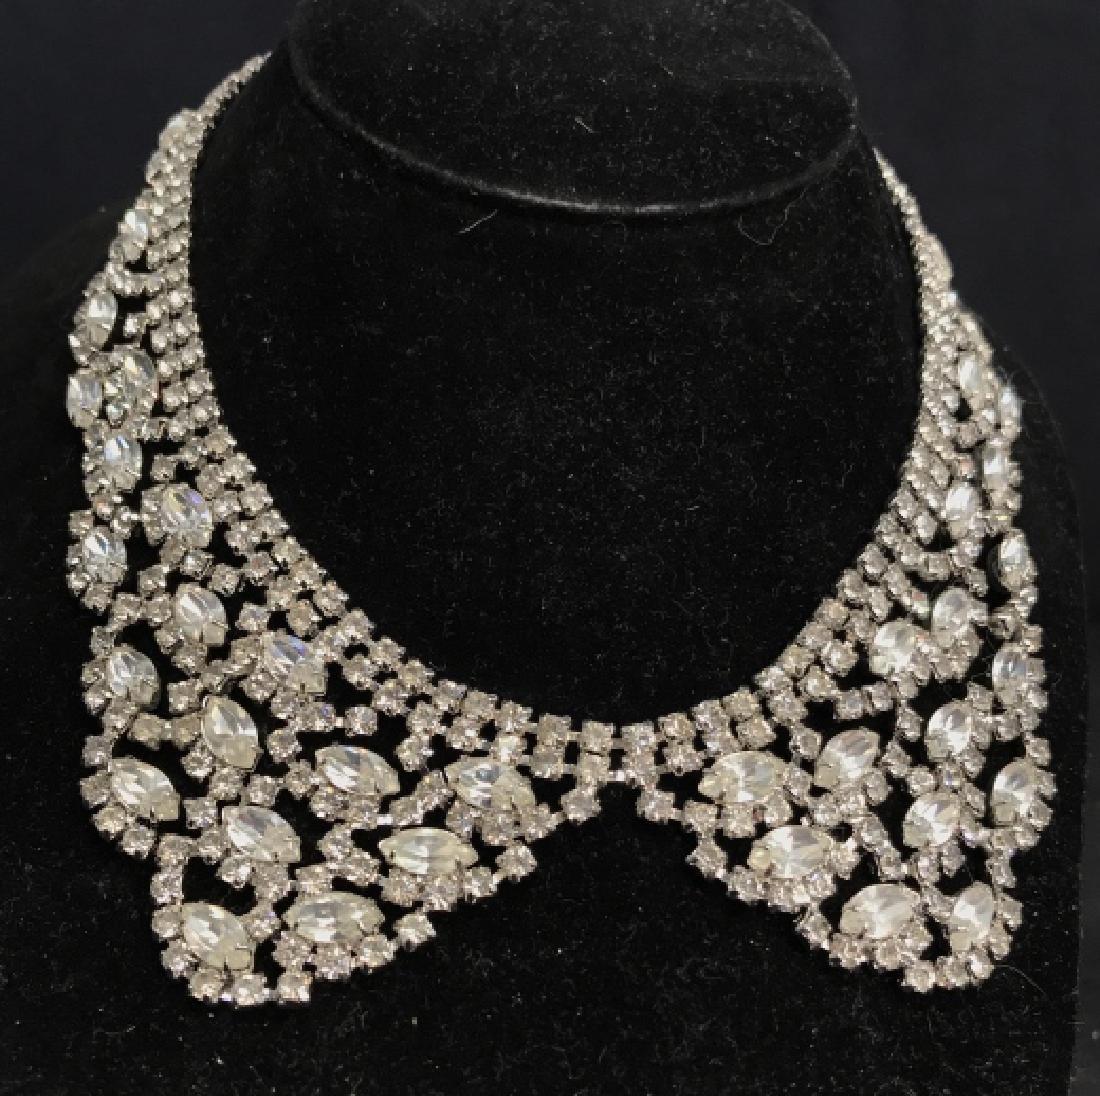 WEISS Vintage Ornate Art Deco Rhinestone Necklace - 8